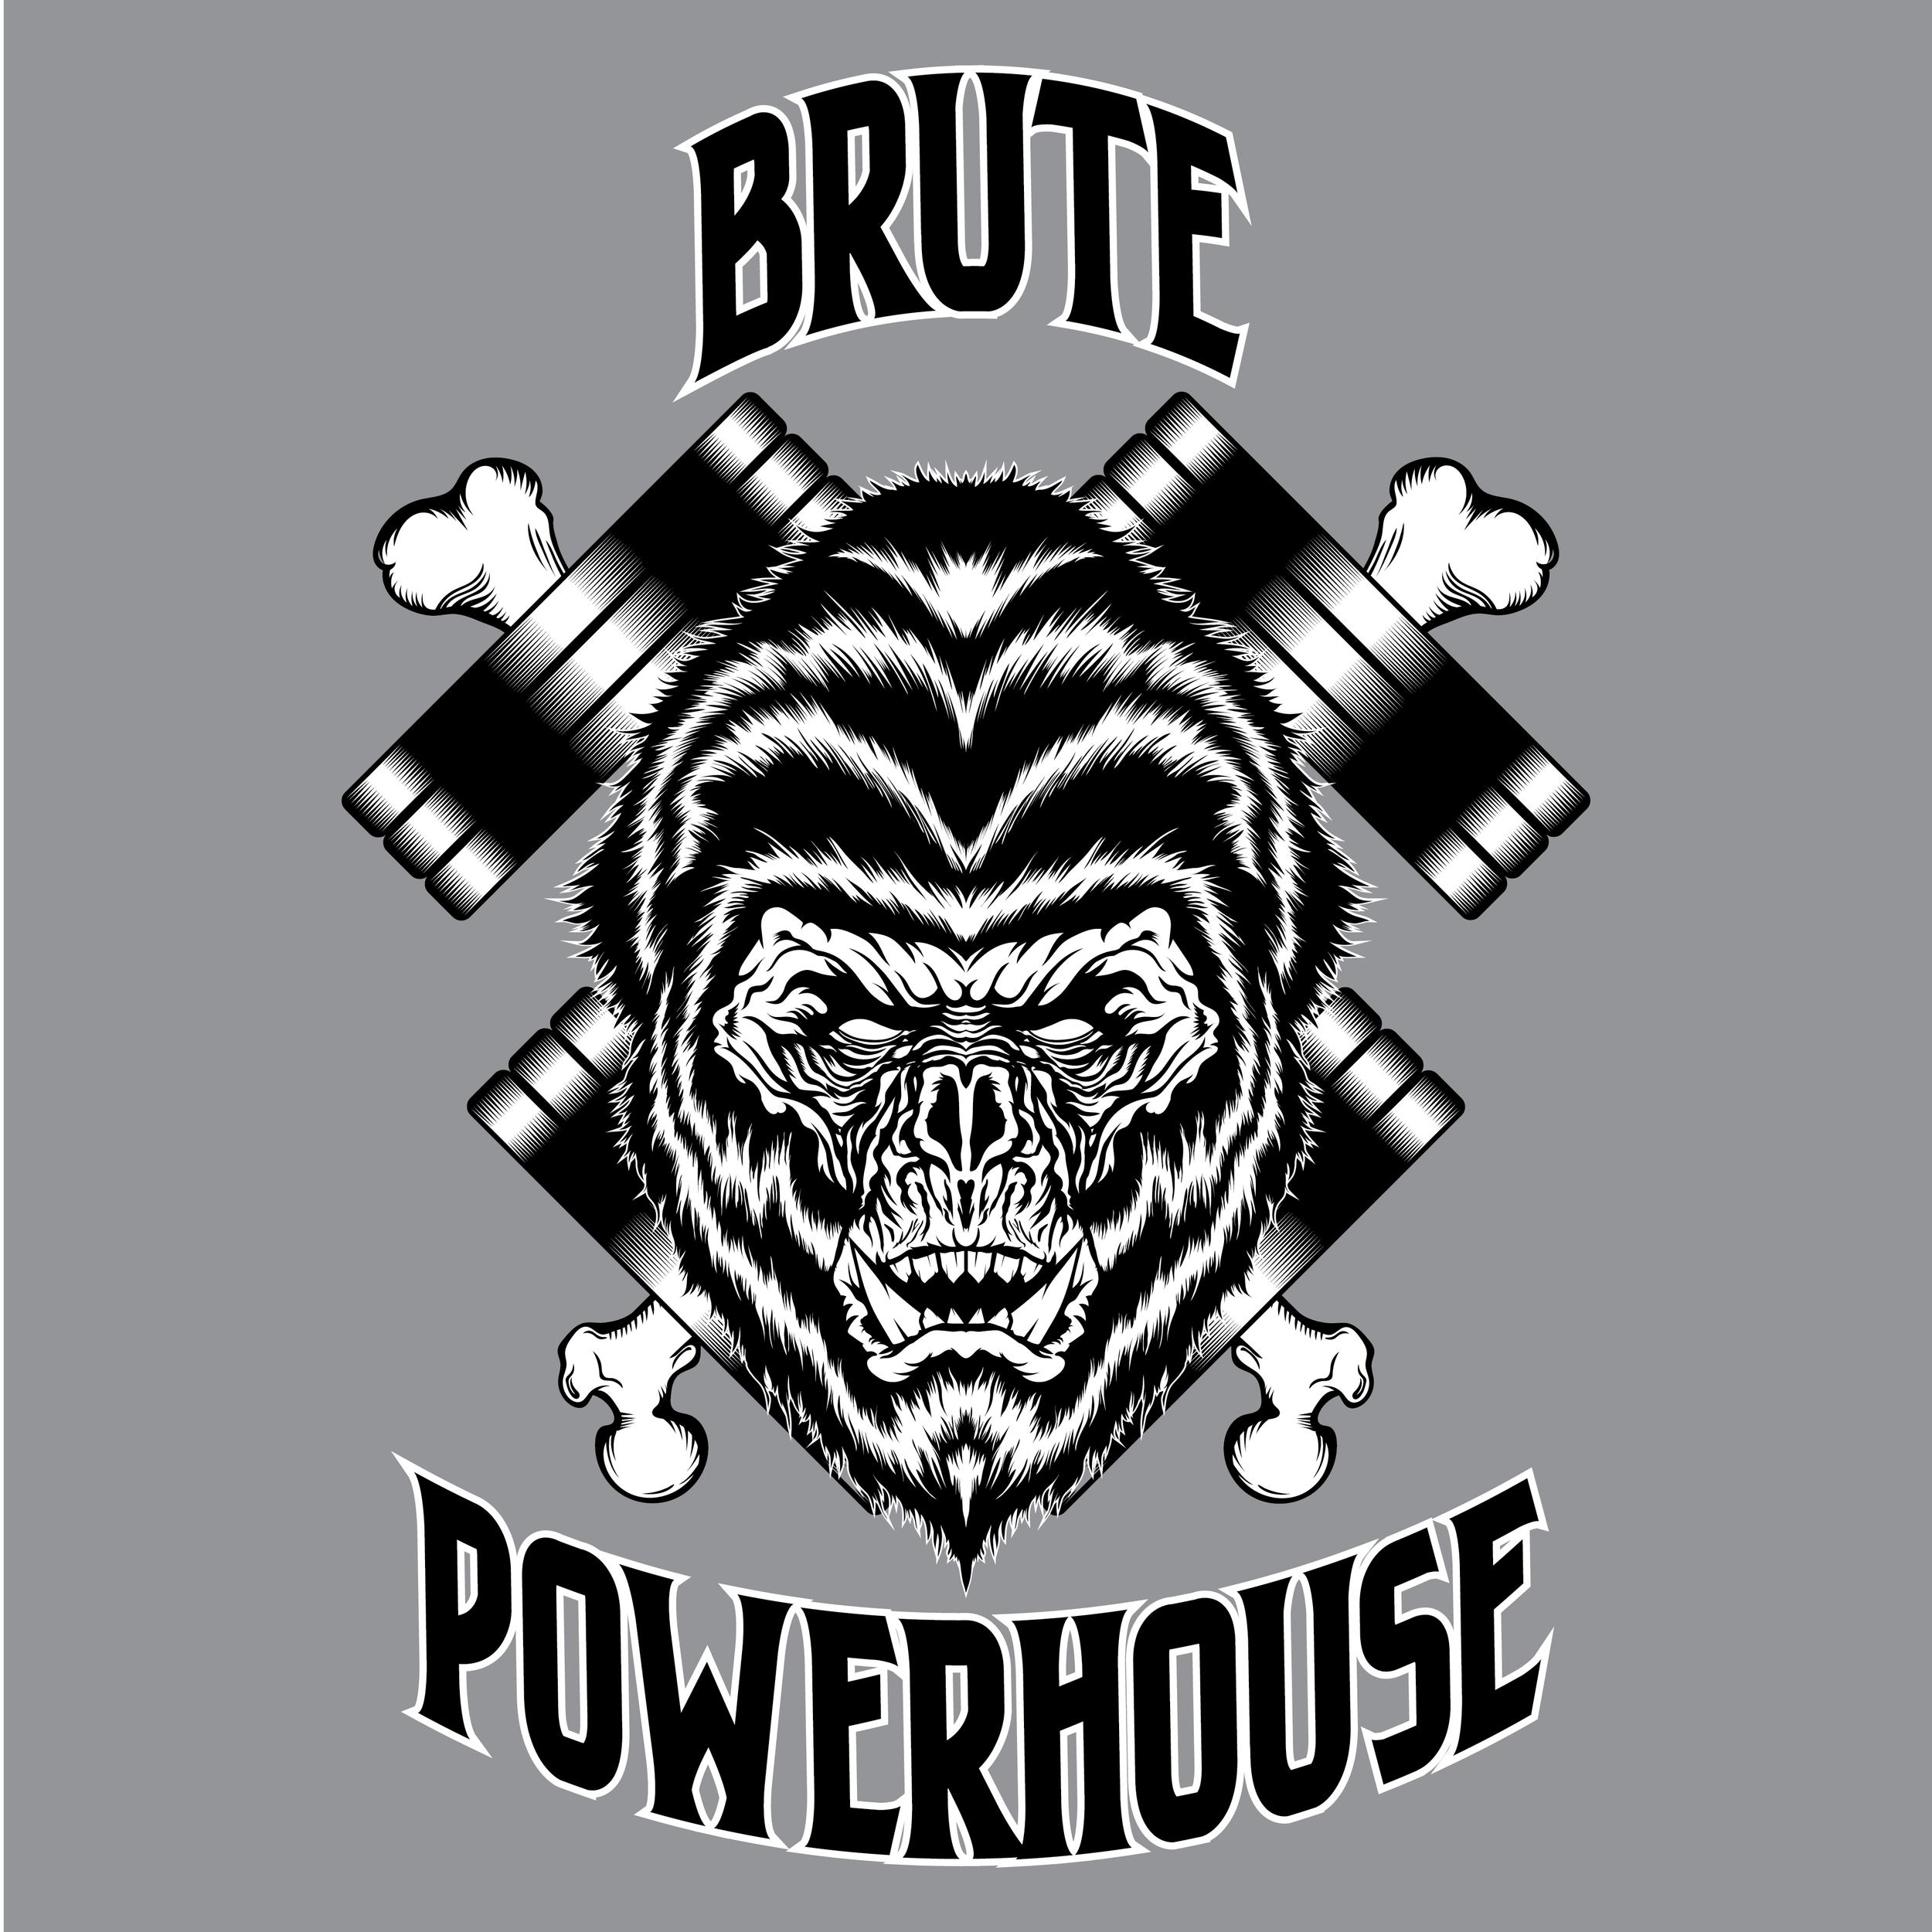 brute-powerhouse-illustration-logo-adobe-illustrator-vector-art-artist-gorilla-monster-ape-savage-gym-crossfit-powerlifting-roberto-orozco-design-graphic-designer-black-white-crosbones-grey.jpg